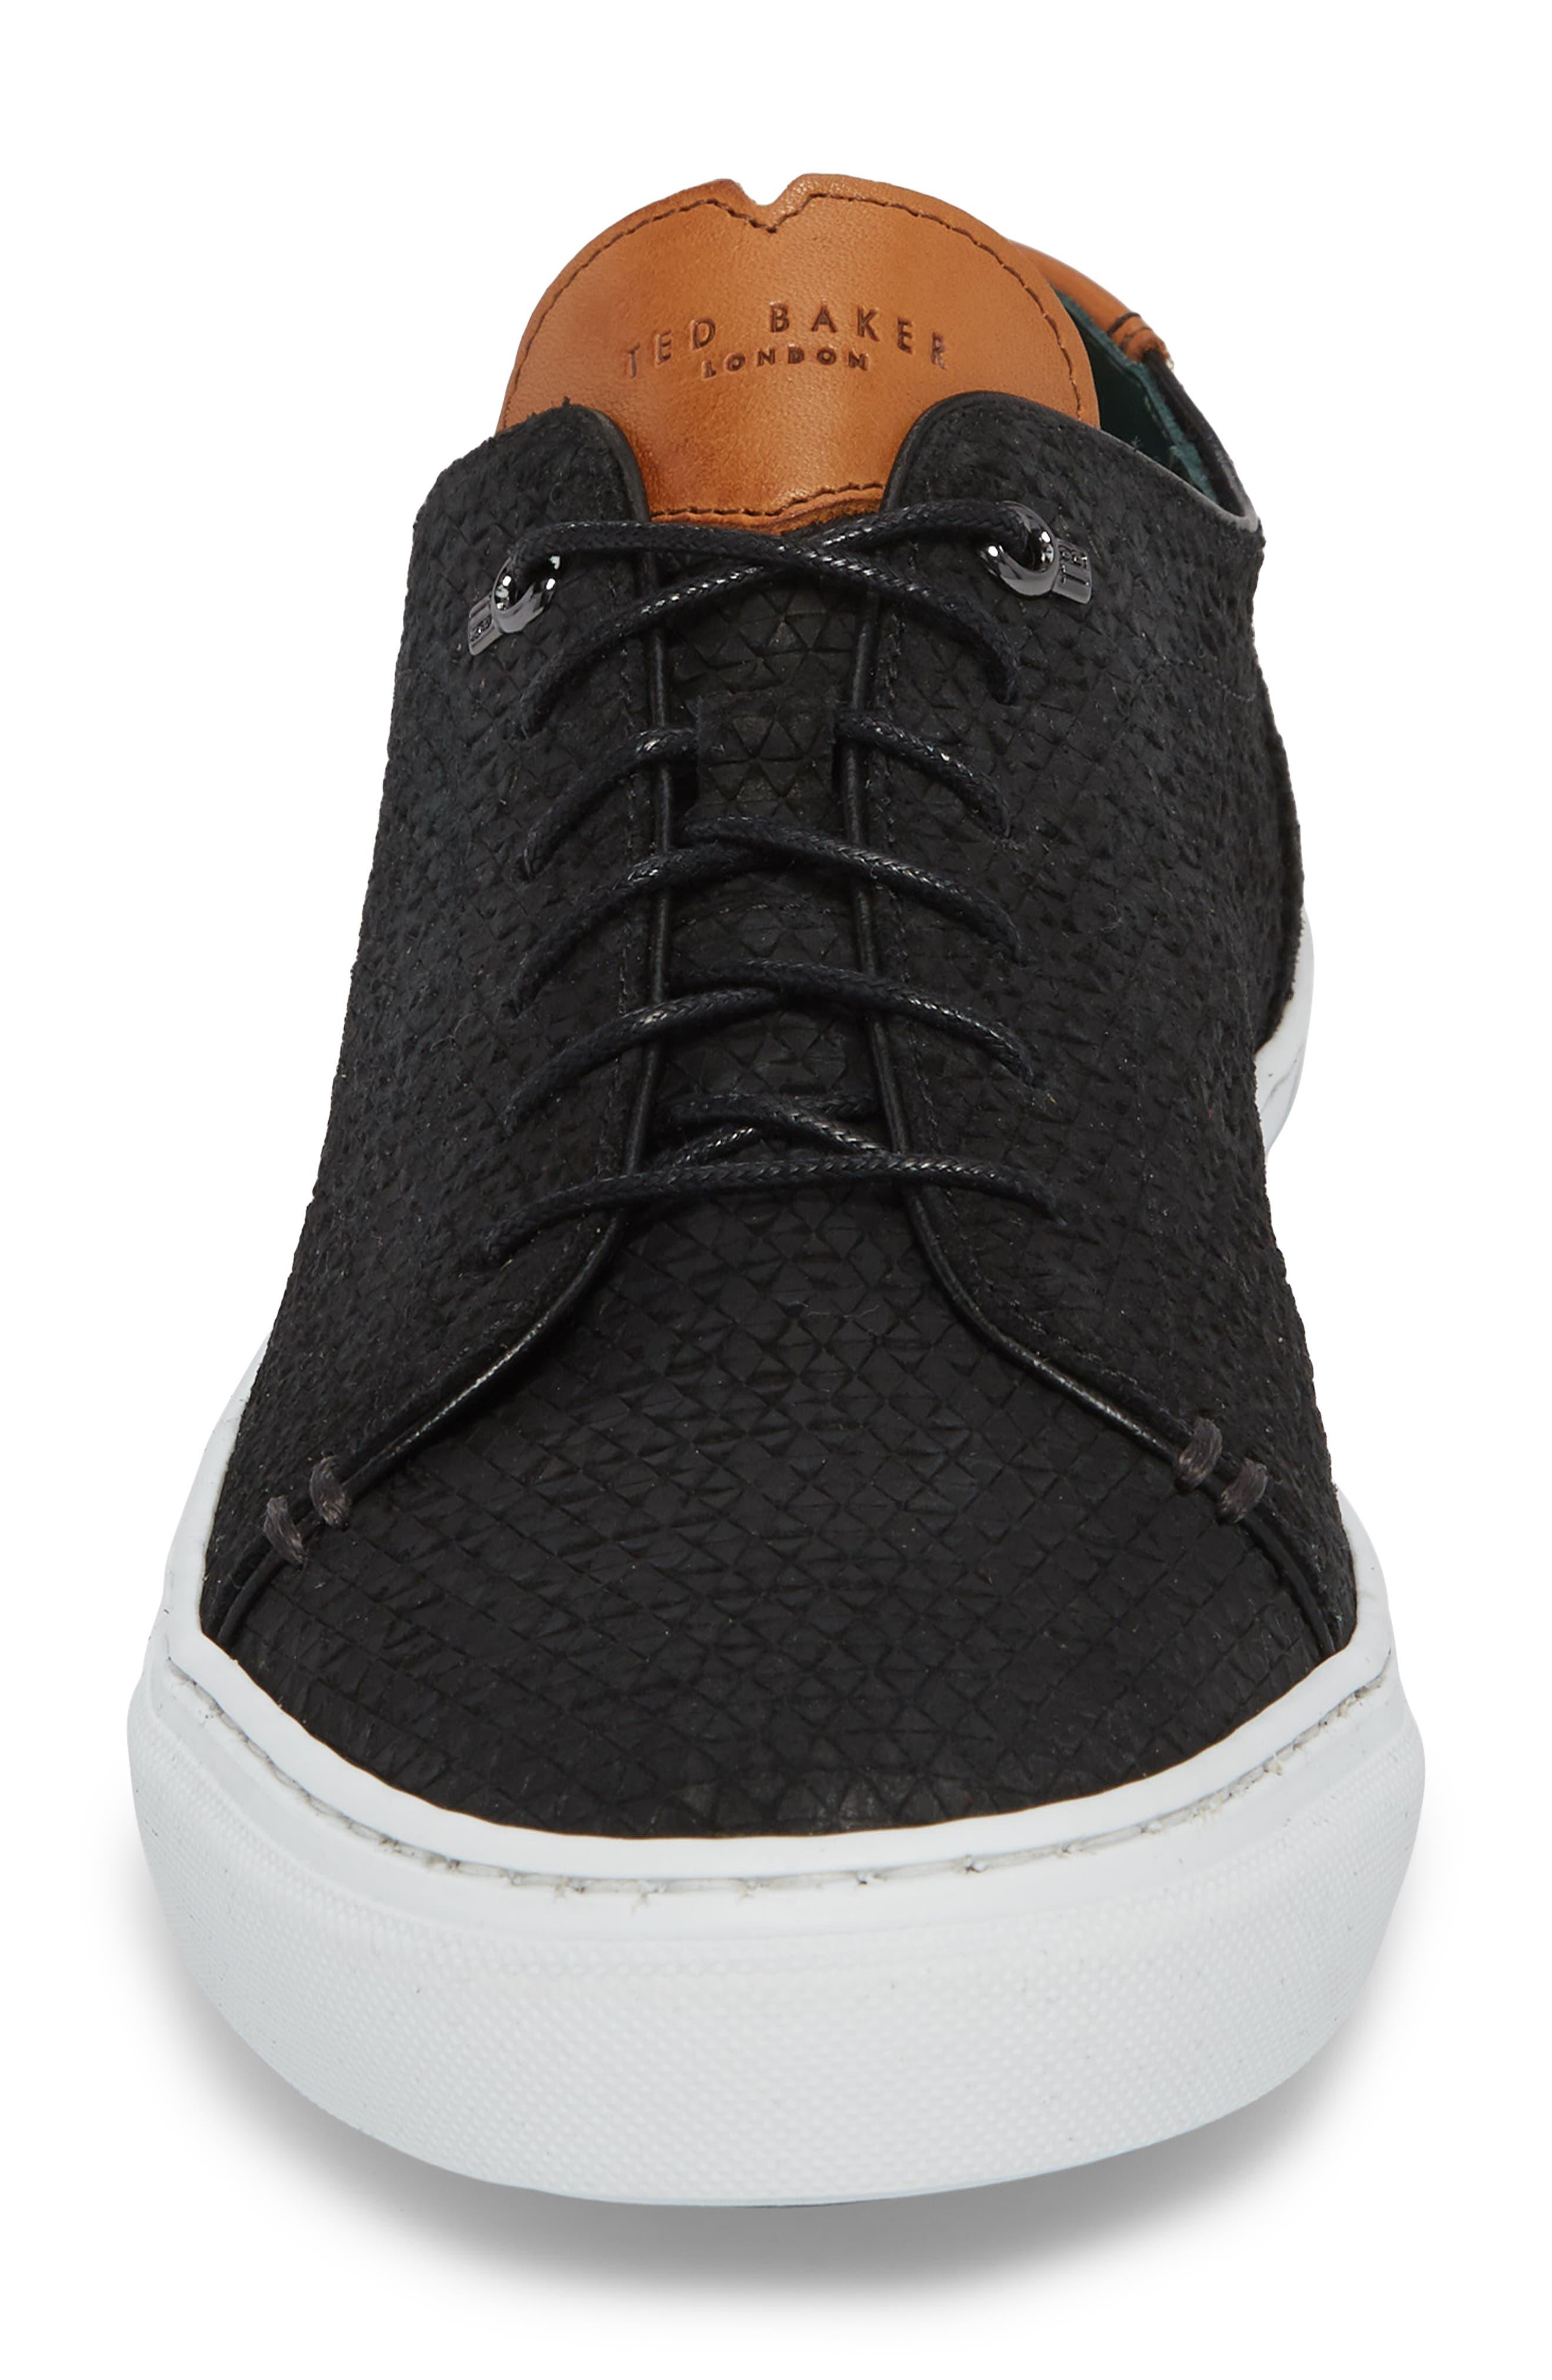 TED BAKER LONDON,                             Duukes Embossed Low Top Sneaker,                             Alternate thumbnail 4, color,                             010